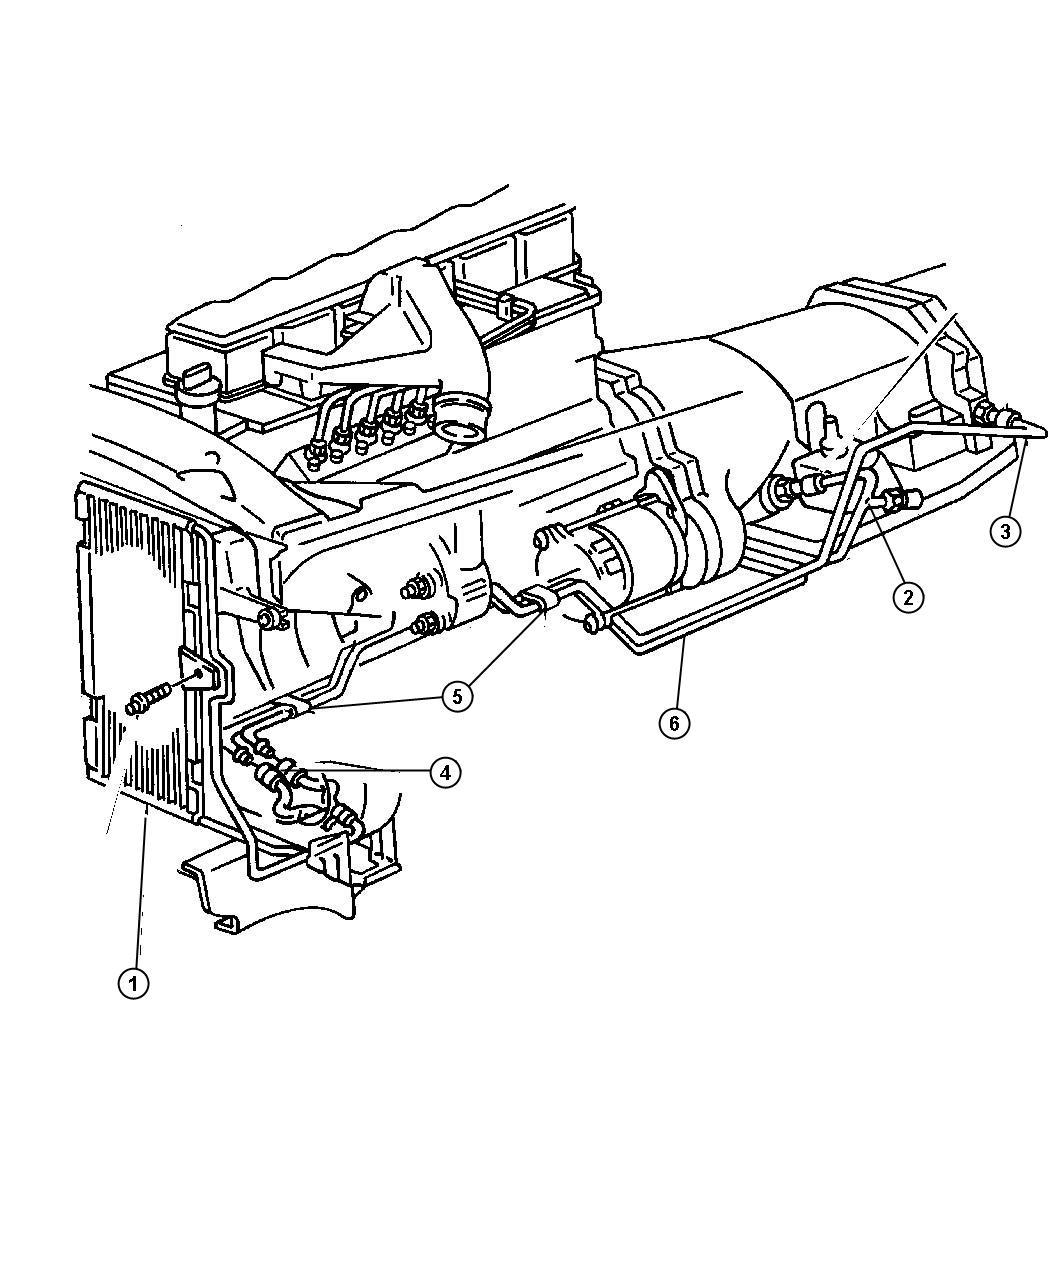 2001 dodge ram 1500 wiring diagram stereo quad cab